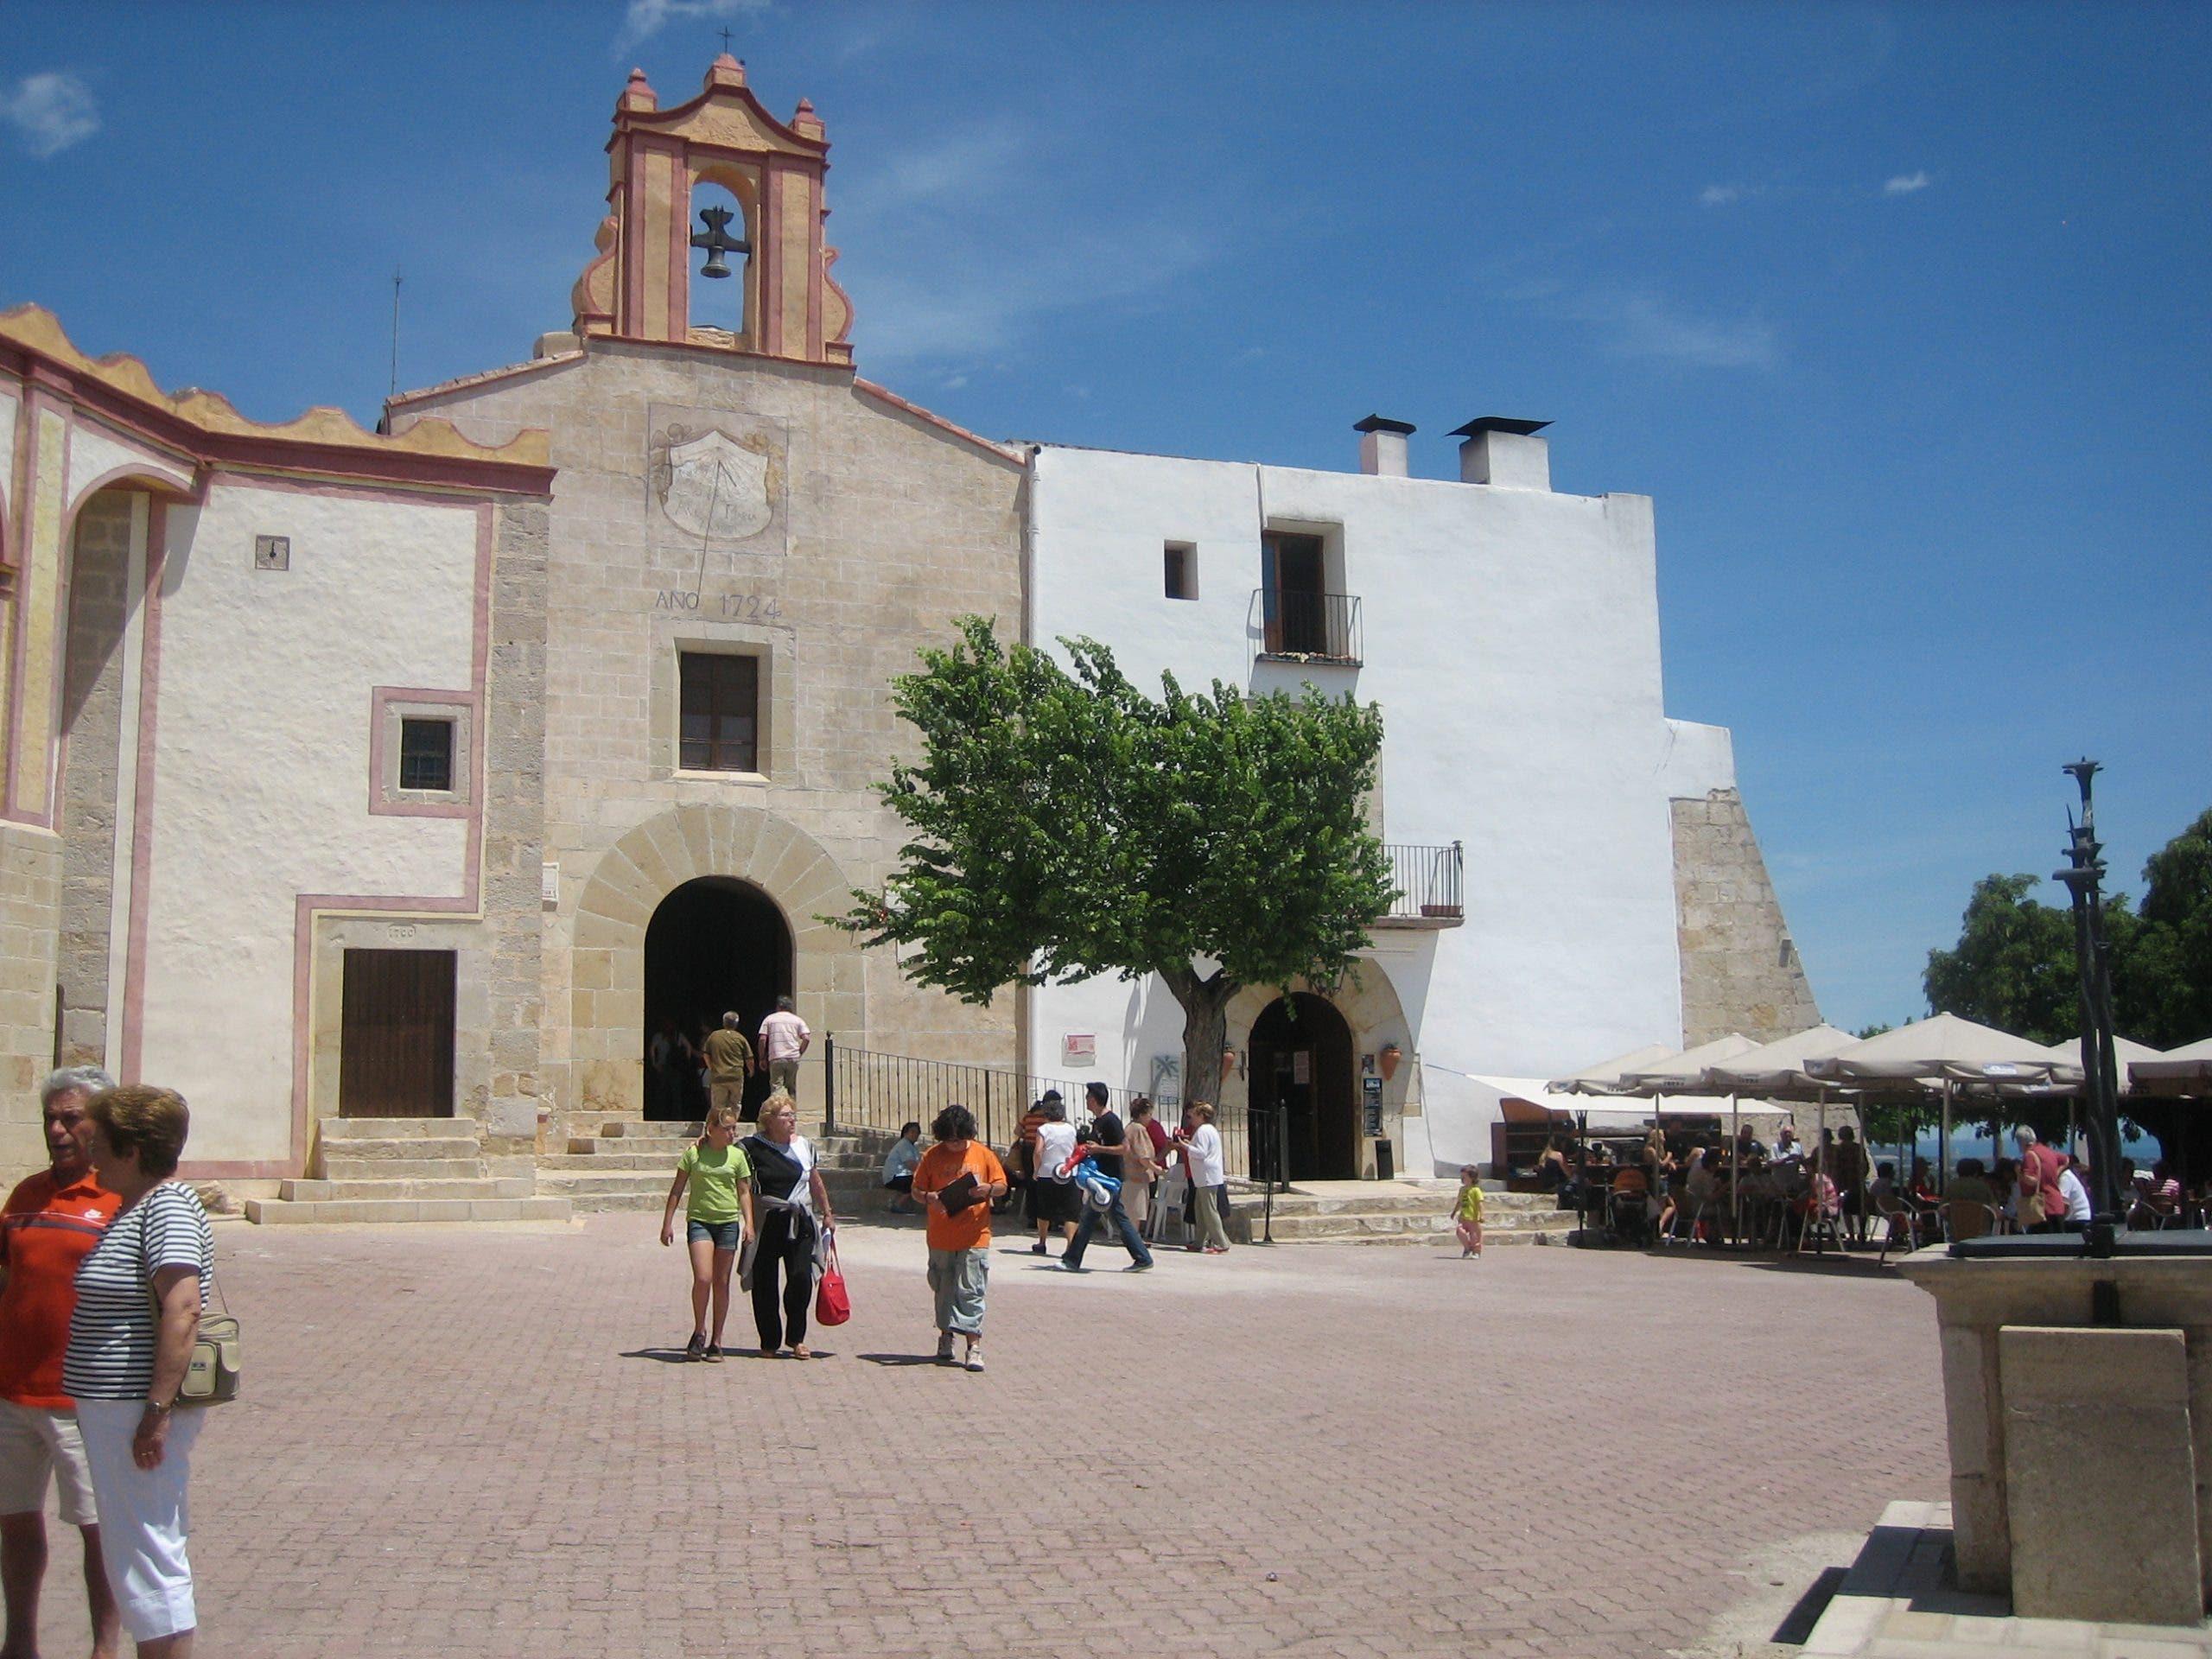 Vinaros square